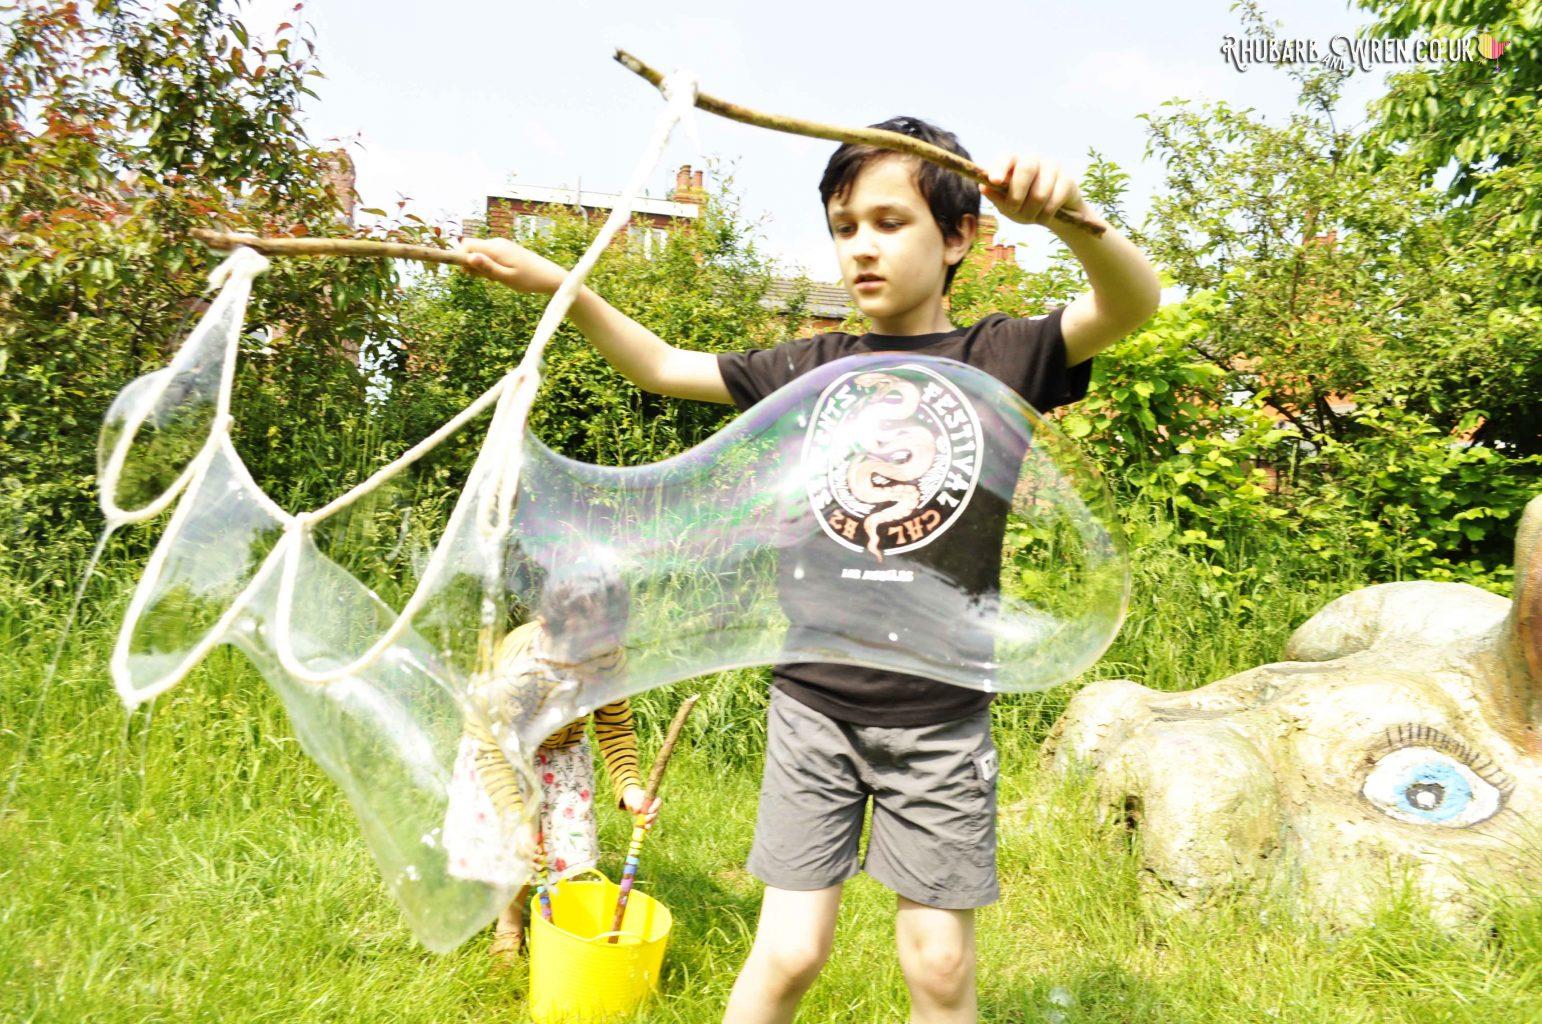 Boy making giant bubbles using a diy bubble mix recipe